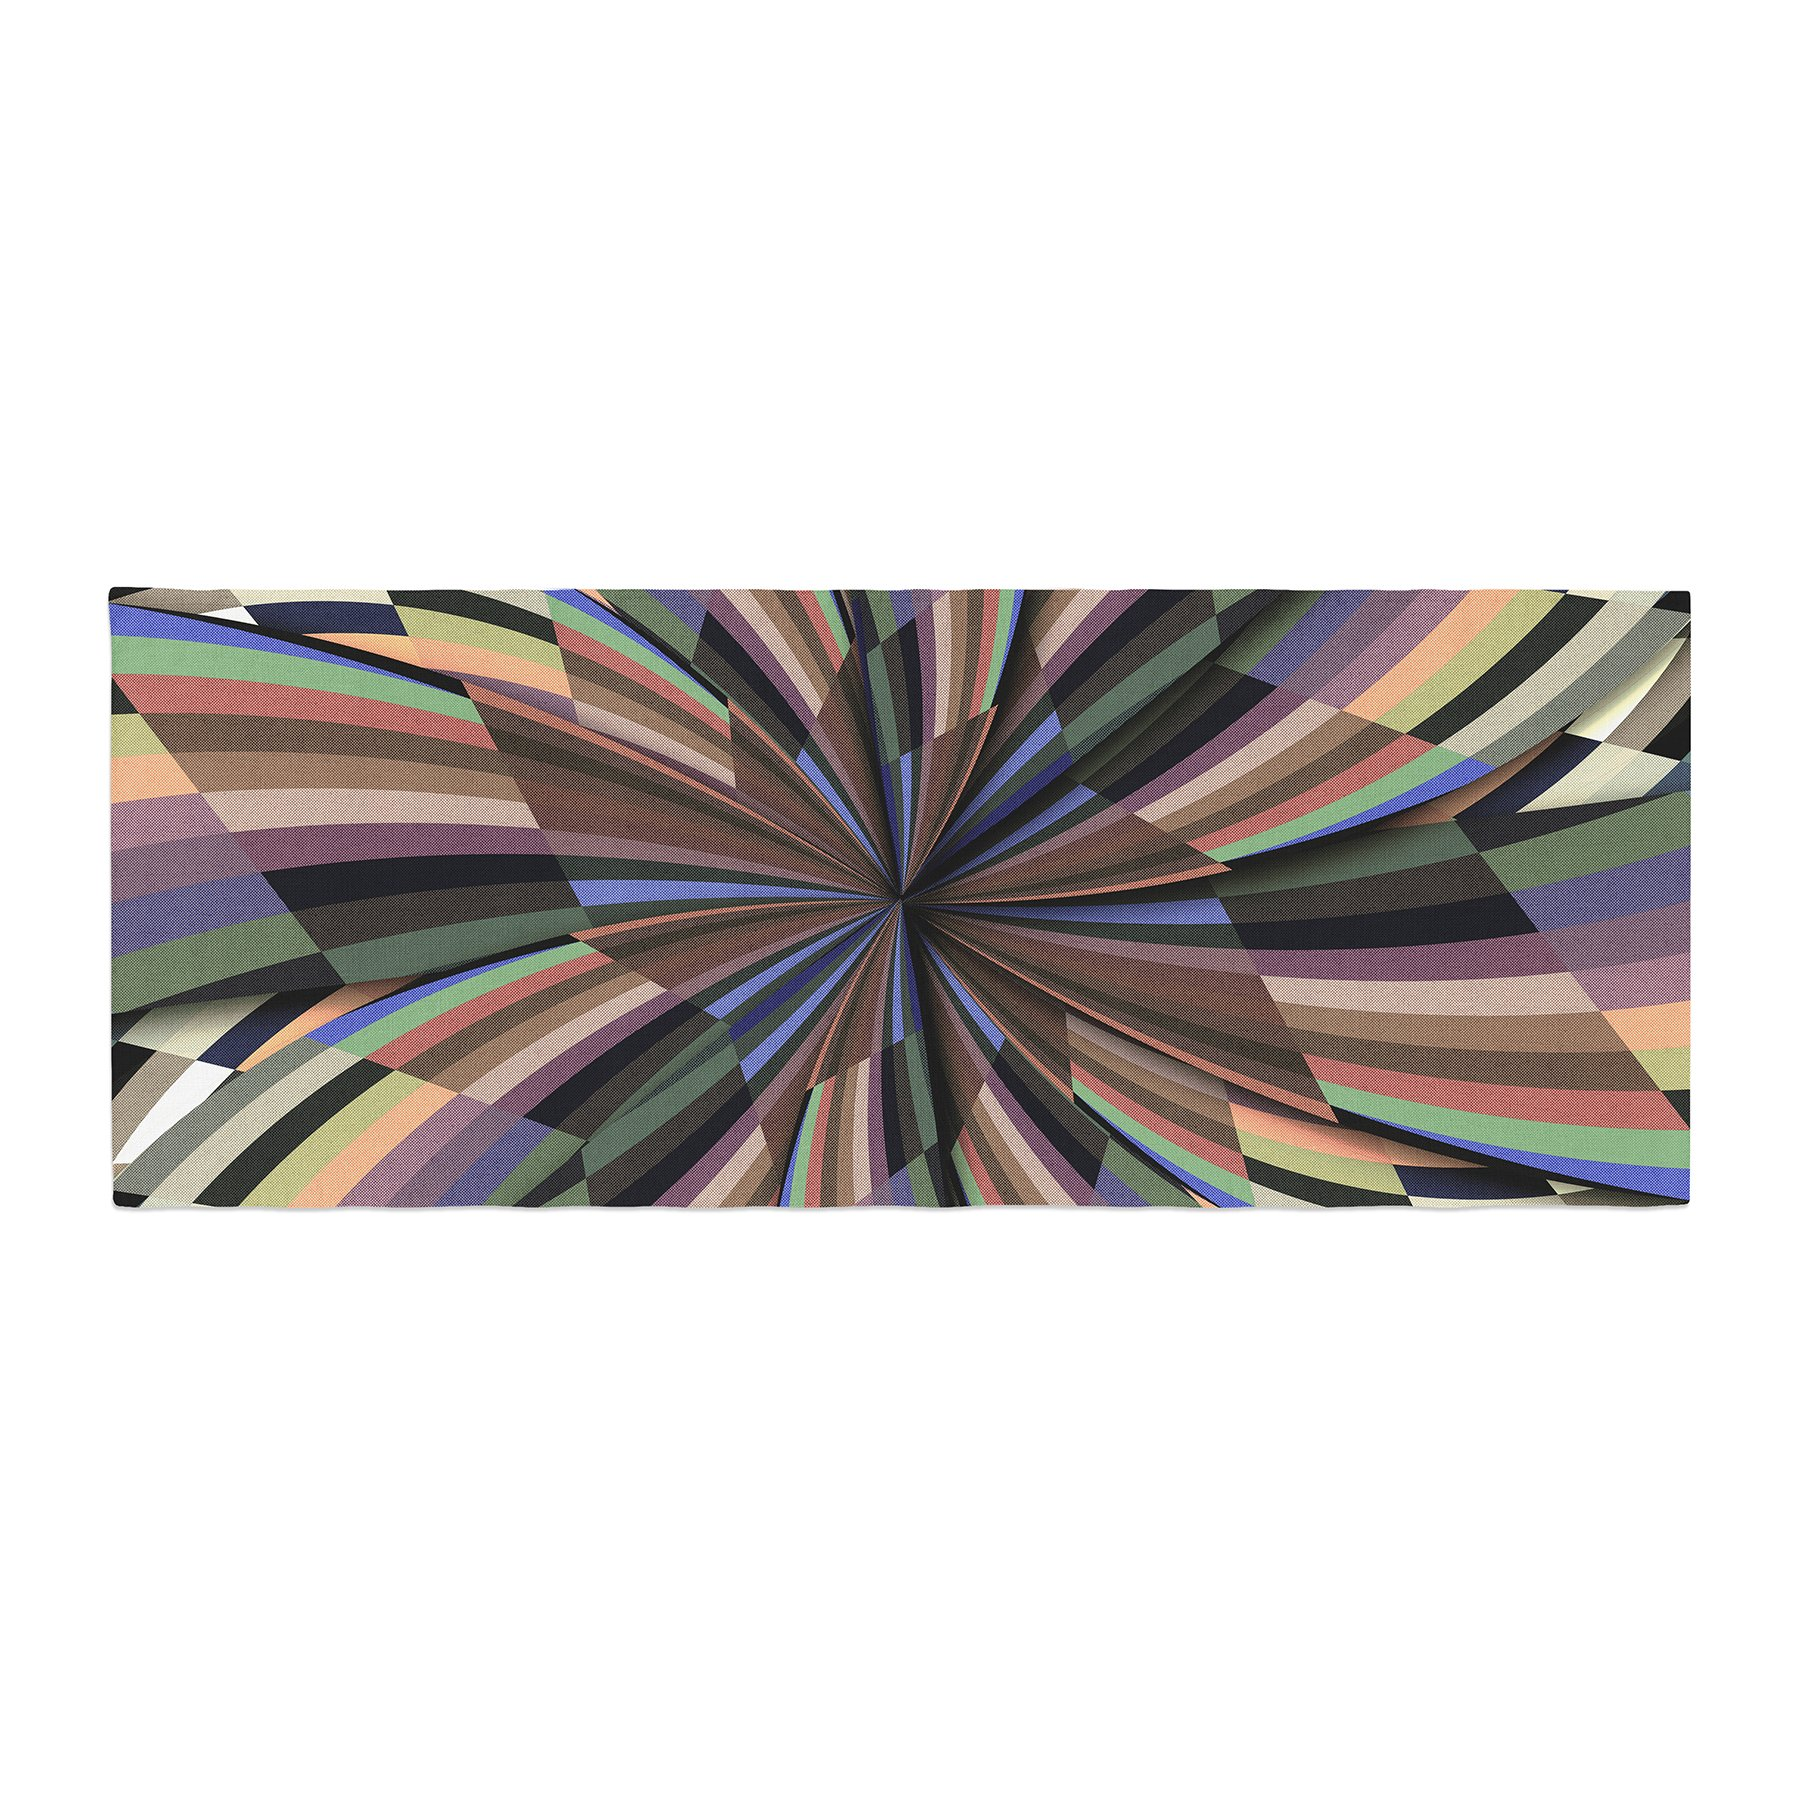 Kess InHouse Danny Ivan Love Affair Beige Geometric Bed Runner, 34'' x 86'' by Kess InHouse (Image #1)